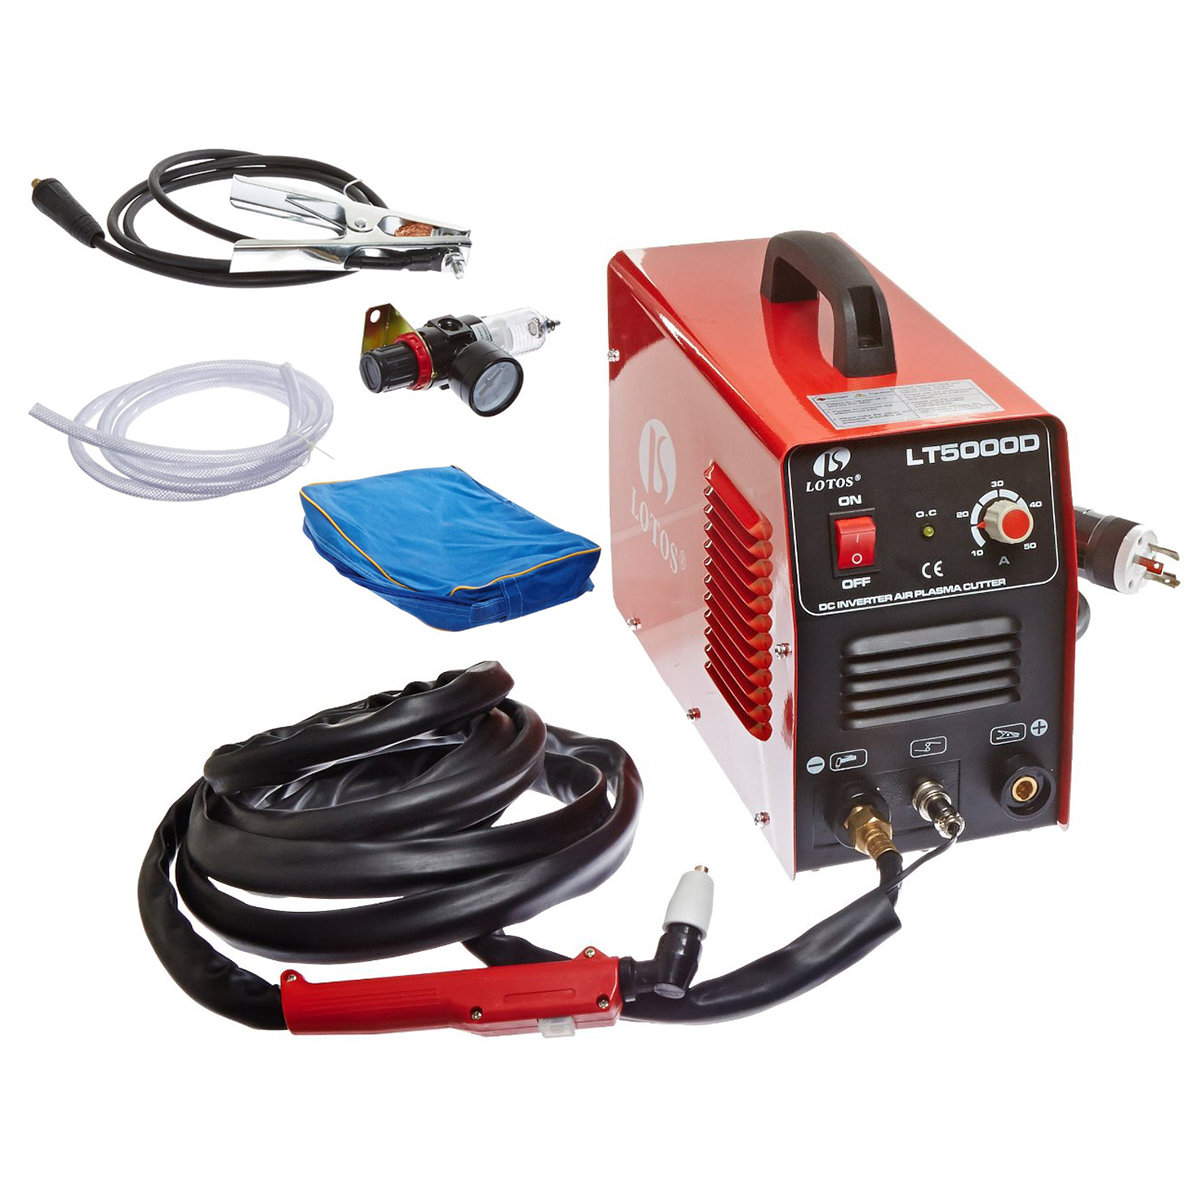 Lotos Dual Voltage (110/220V) 50 Amp Plasma Cutter withou...